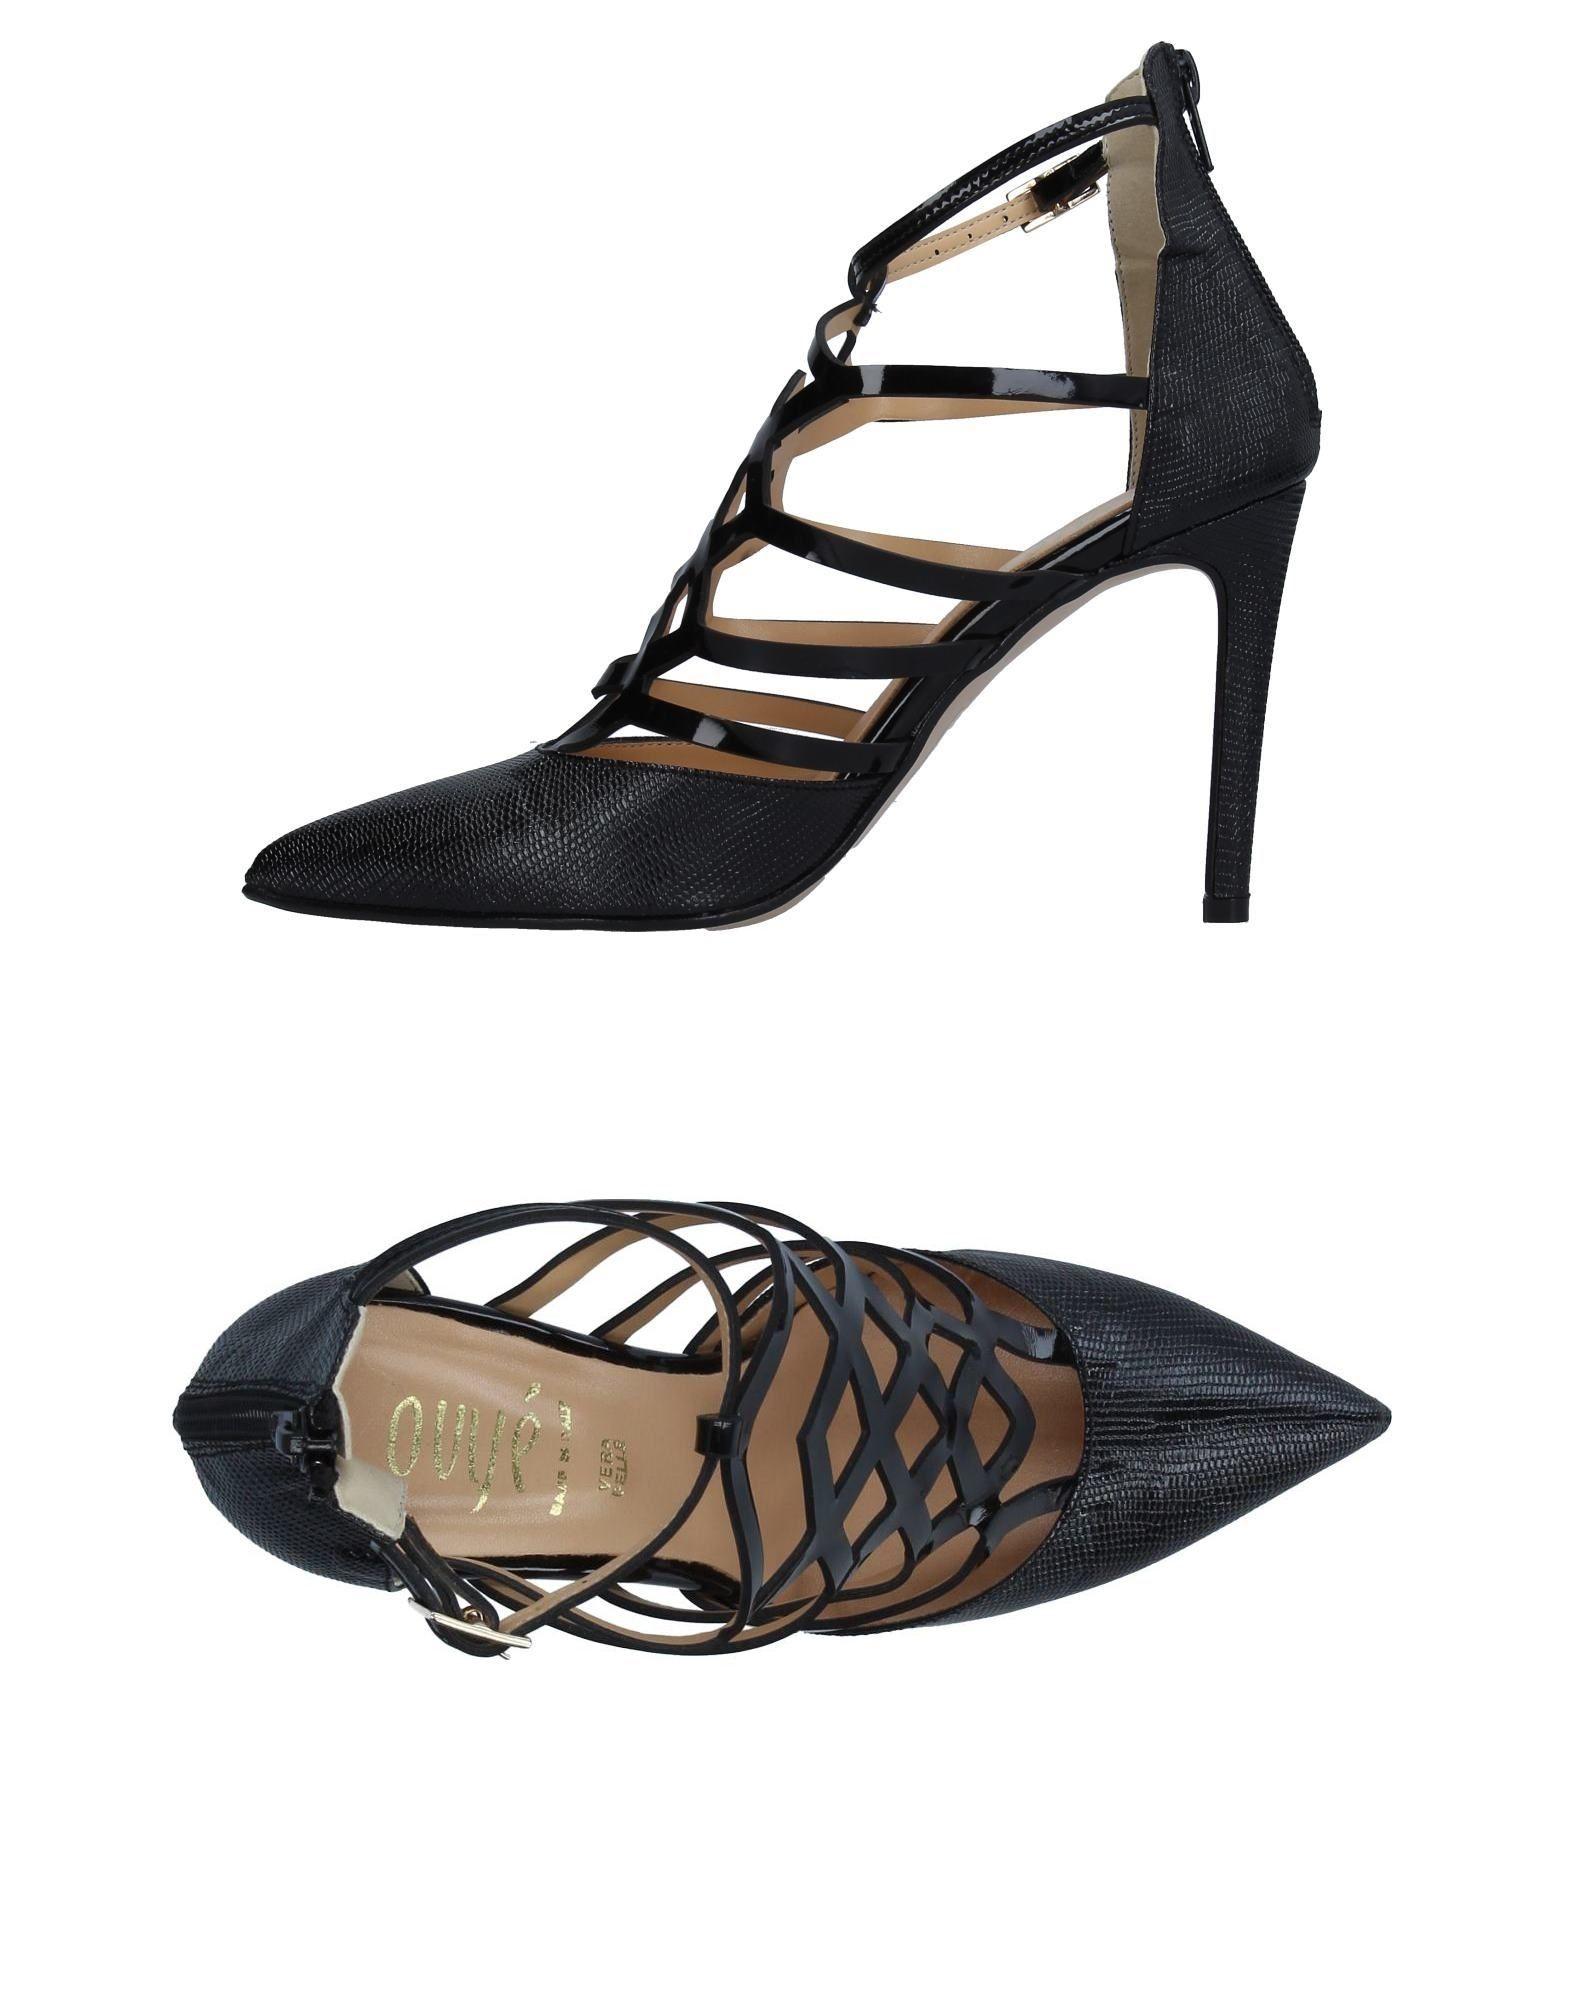 Ovye' By Cristina Lucchi Pumps Damen  11333246QX Gute Qualität beliebte Schuhe